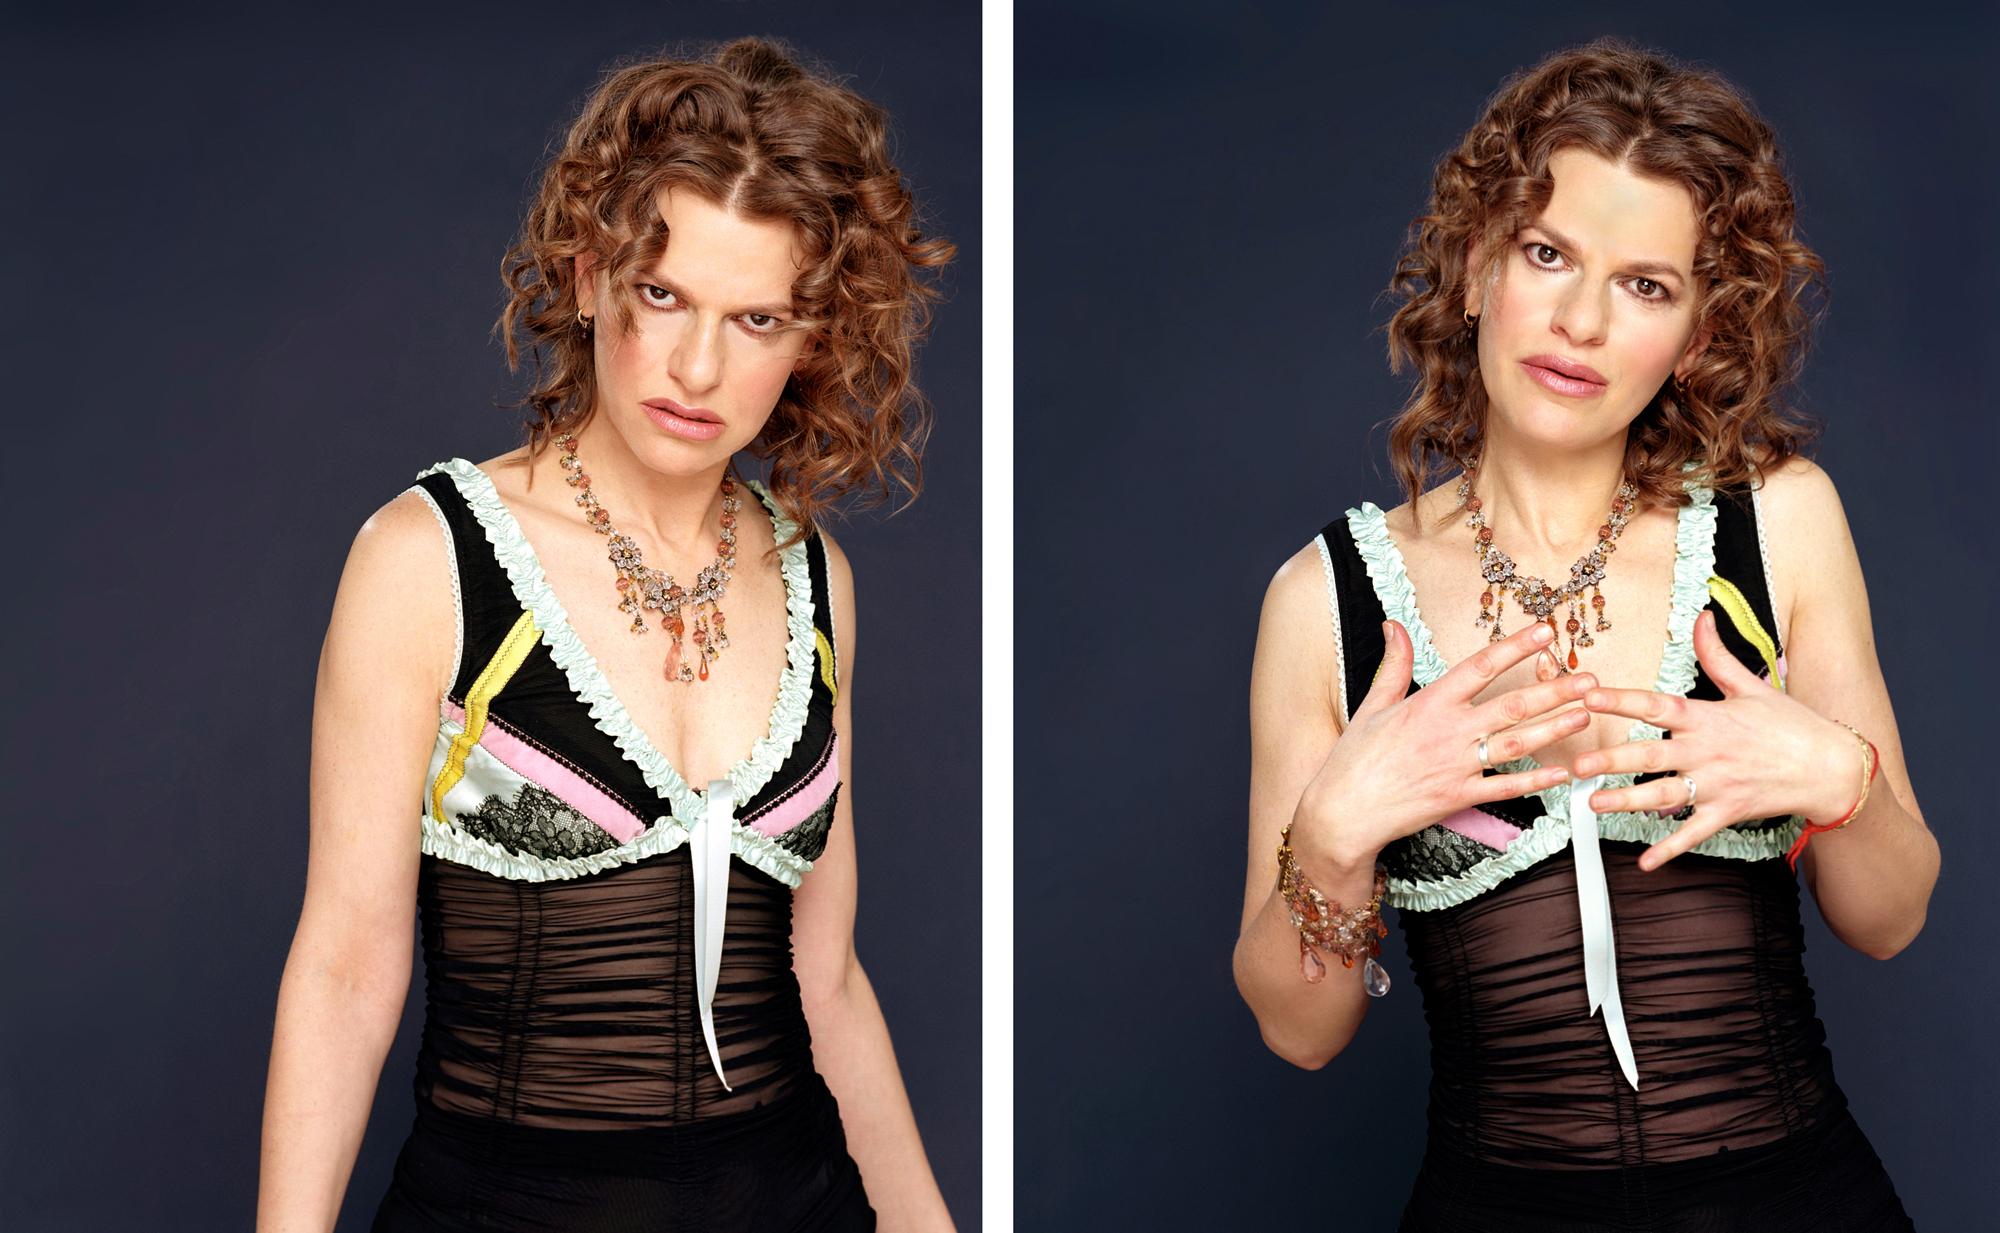 robert-caldarone-sandra-bernhard-celebrity-portrait-1.jpg